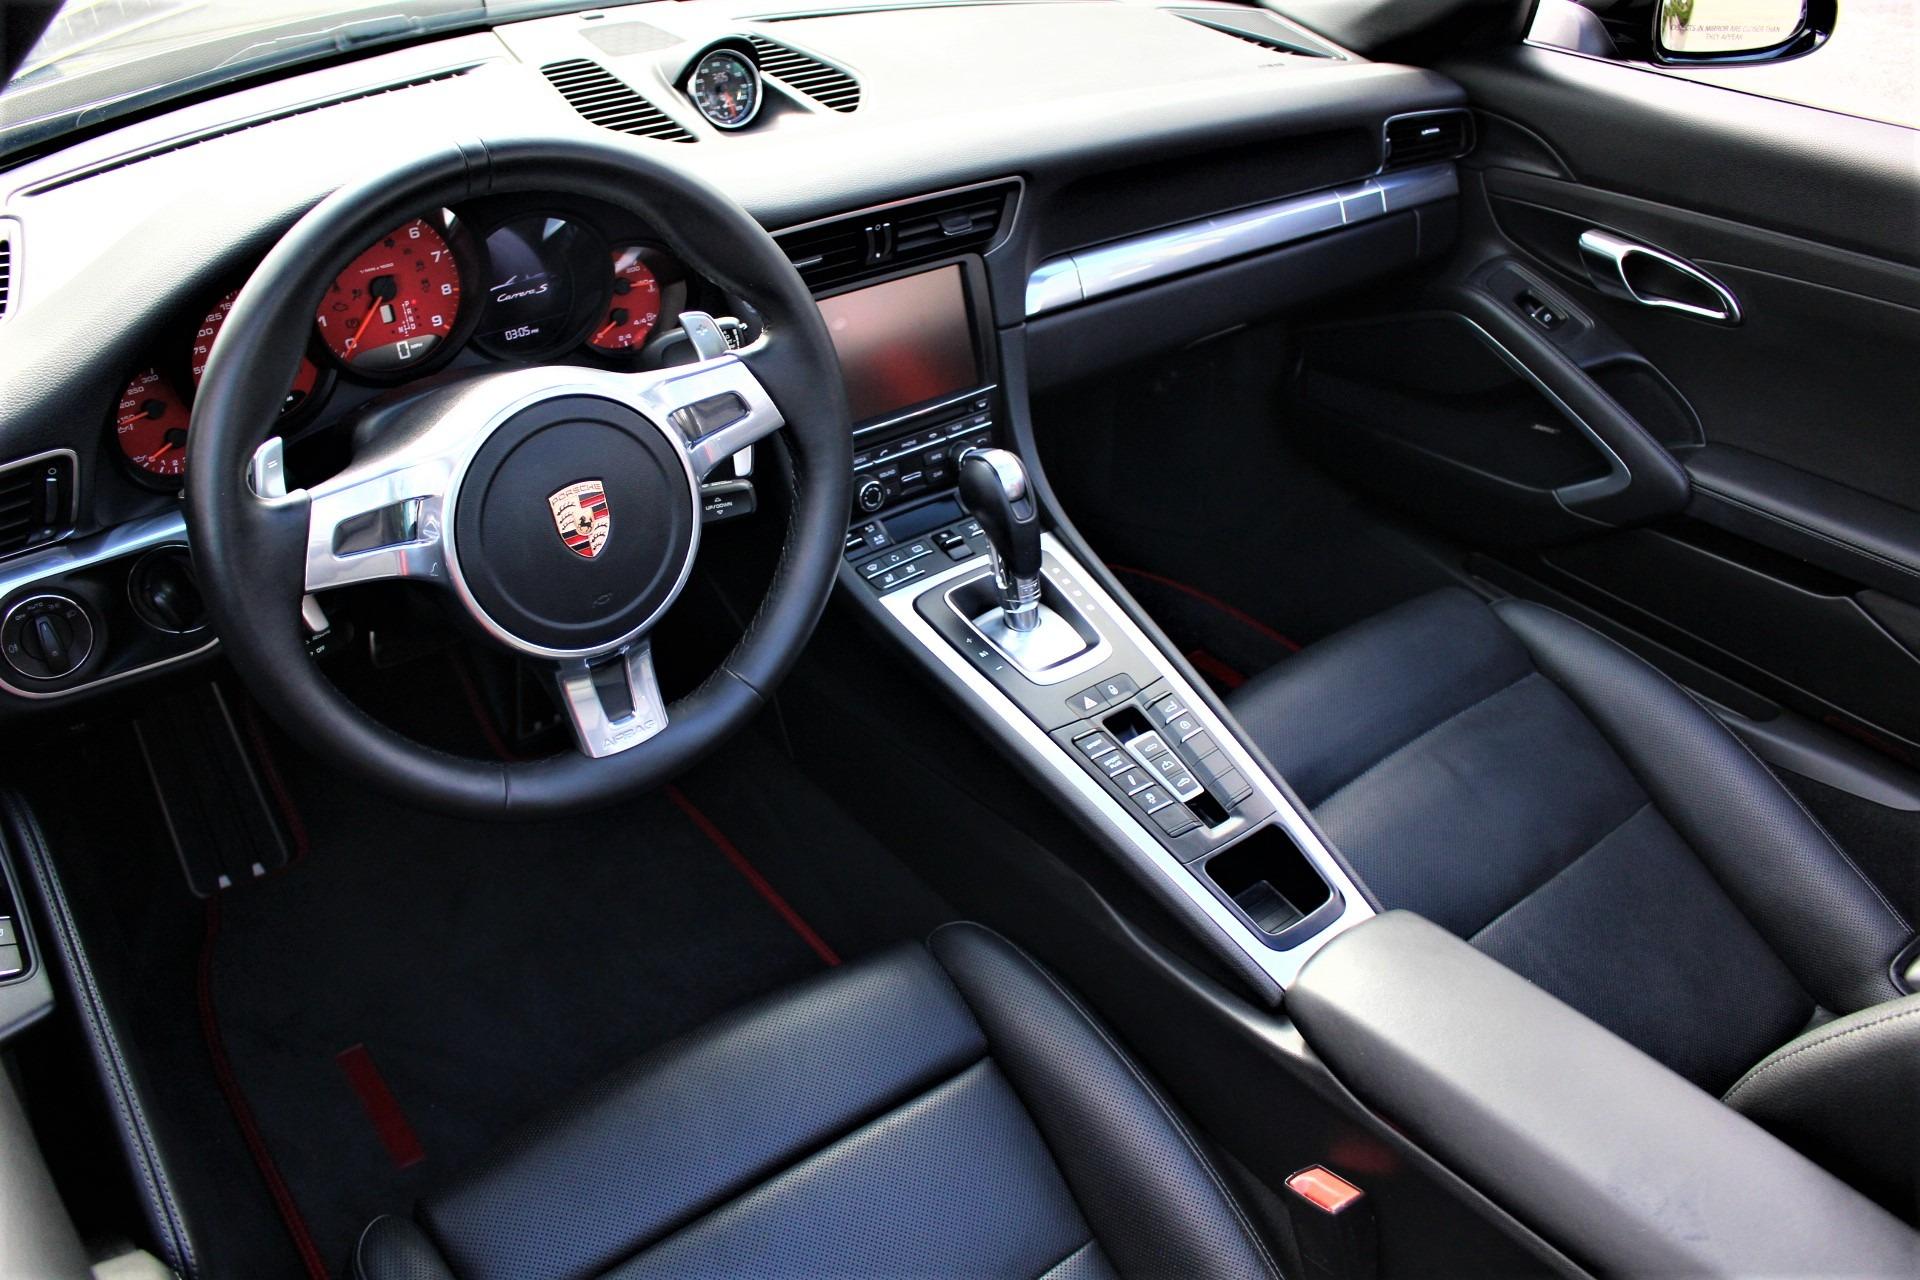 Used 2013 Porsche 911 Carrera S for sale $85,850 at The Gables Sports Cars in Miami FL 33146 4